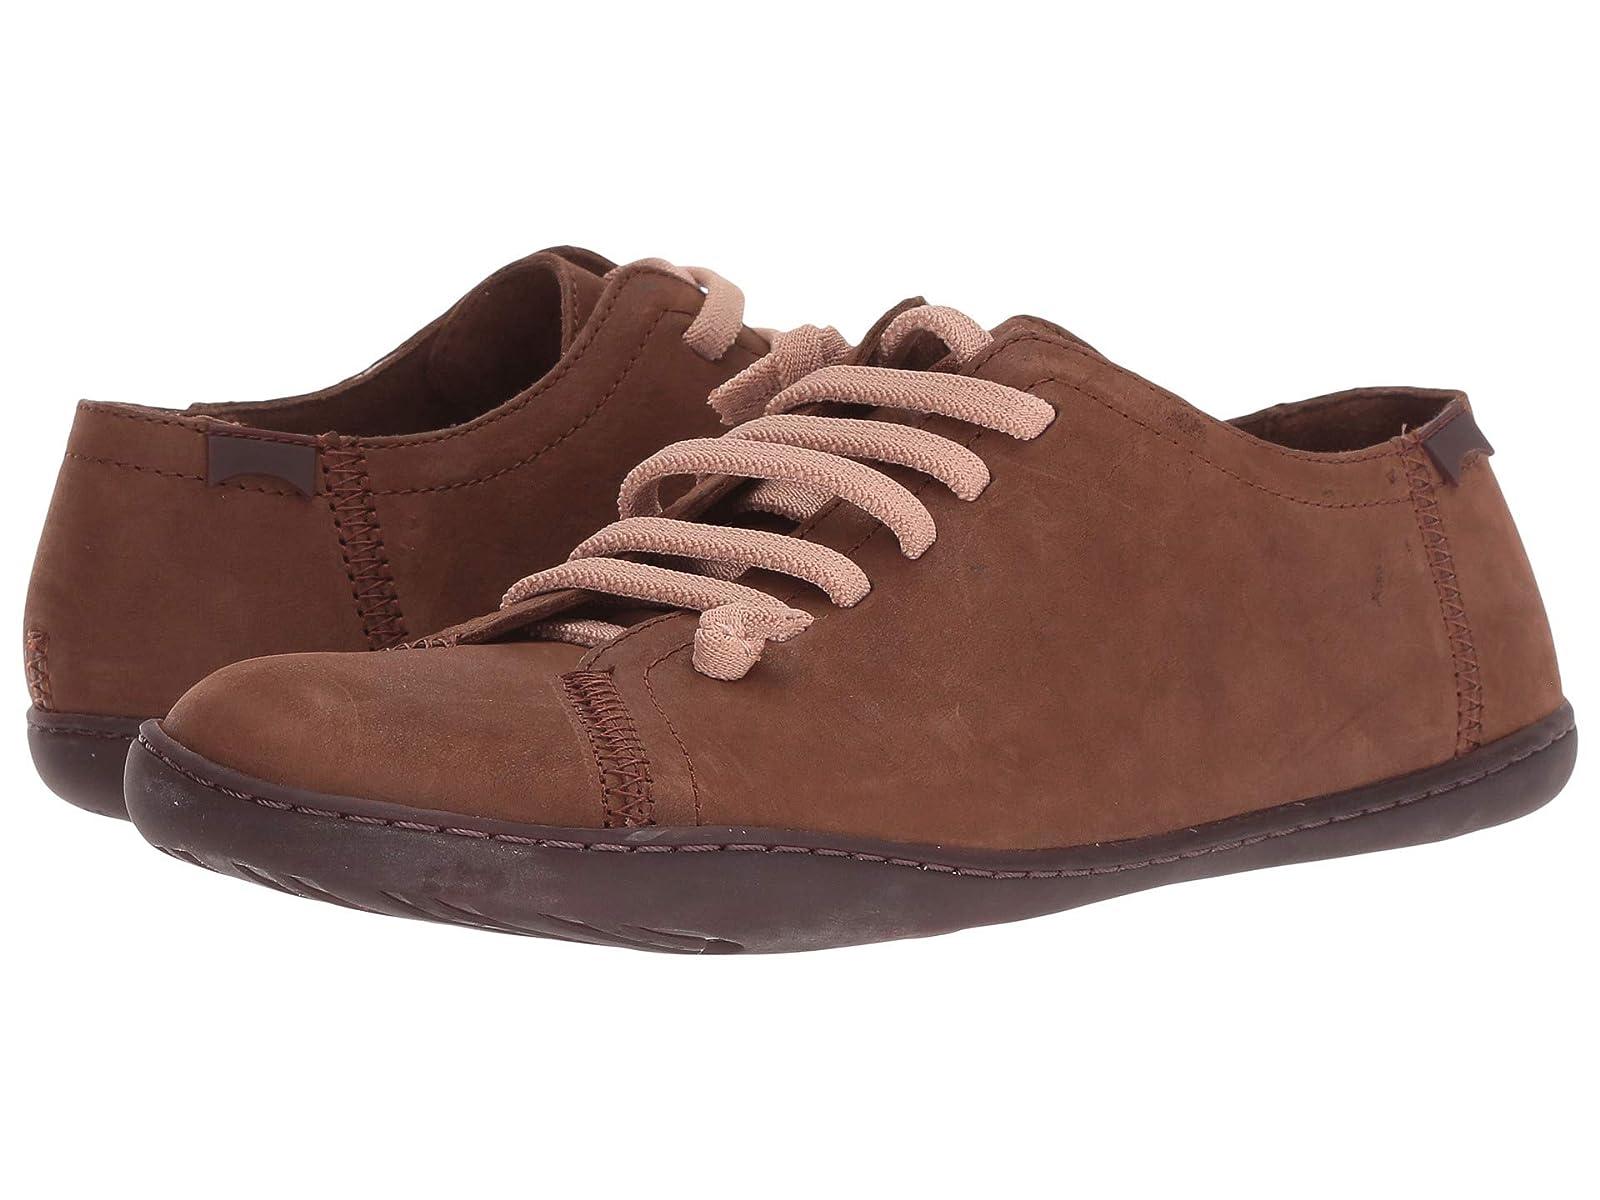 Camper Peu Cami 20848Atmospheric grades have affordable shoes